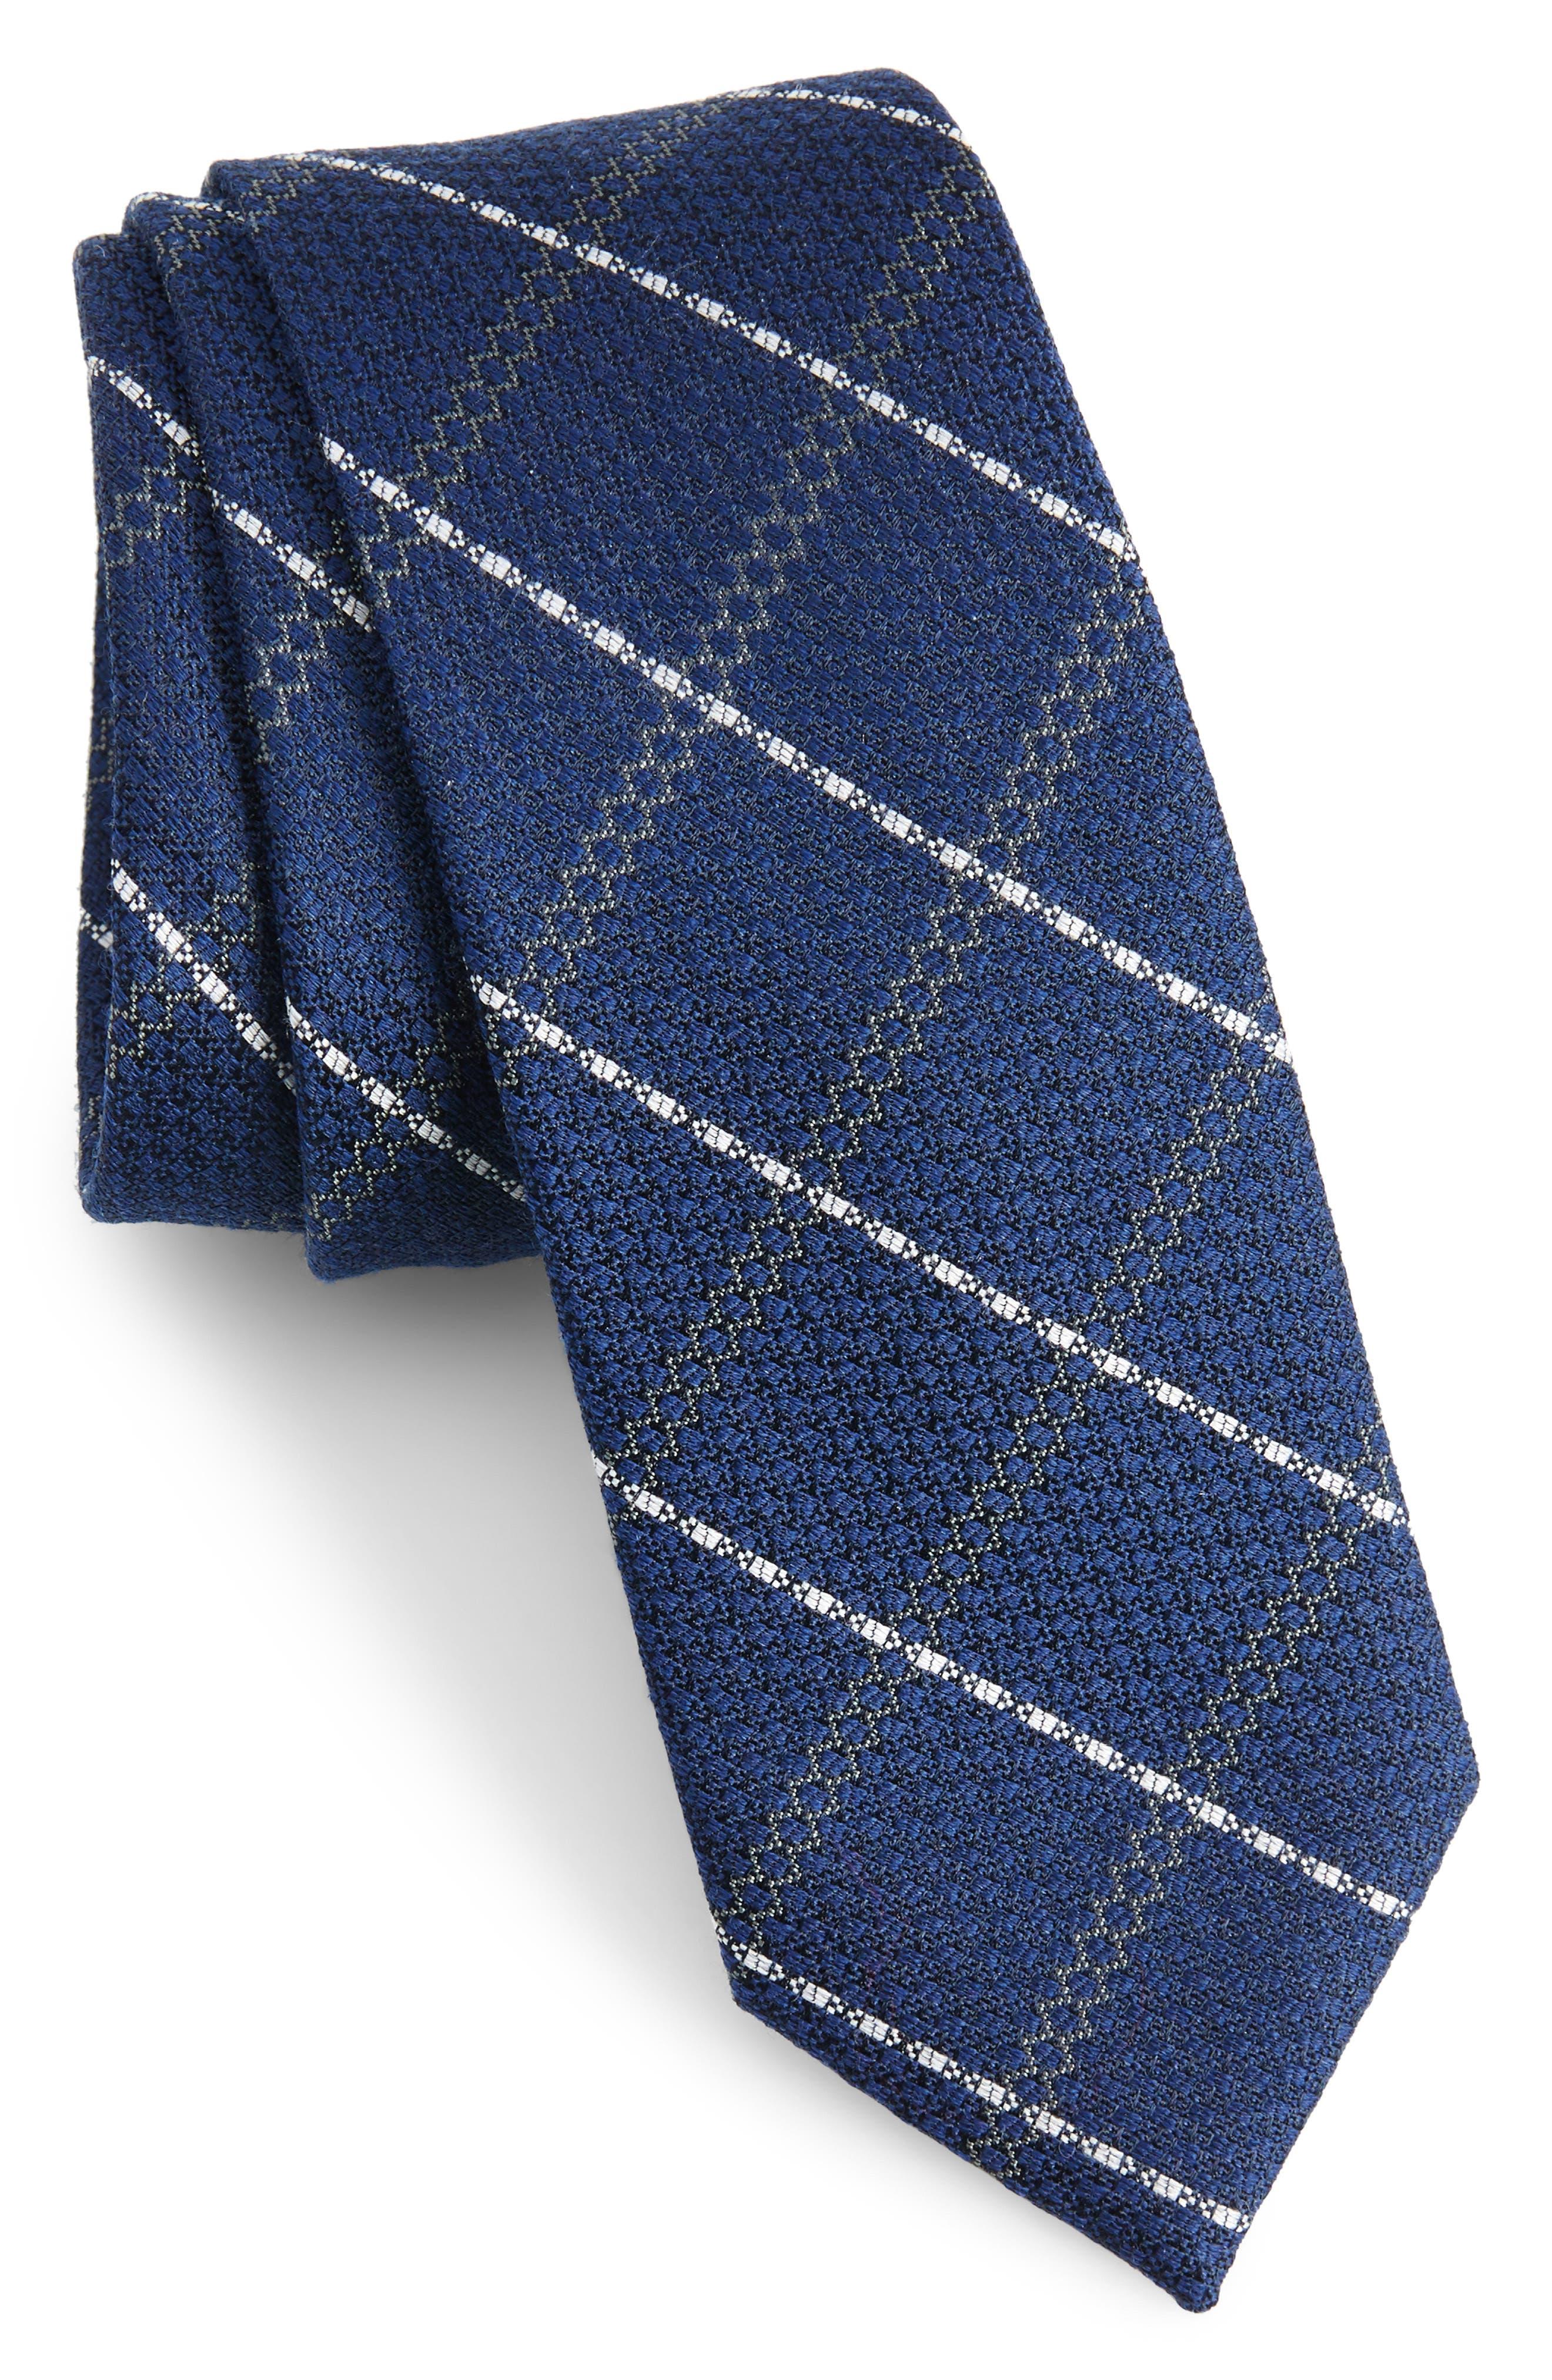 Plaid Silk & Wool Tie,                         Main,                         color, NAVY